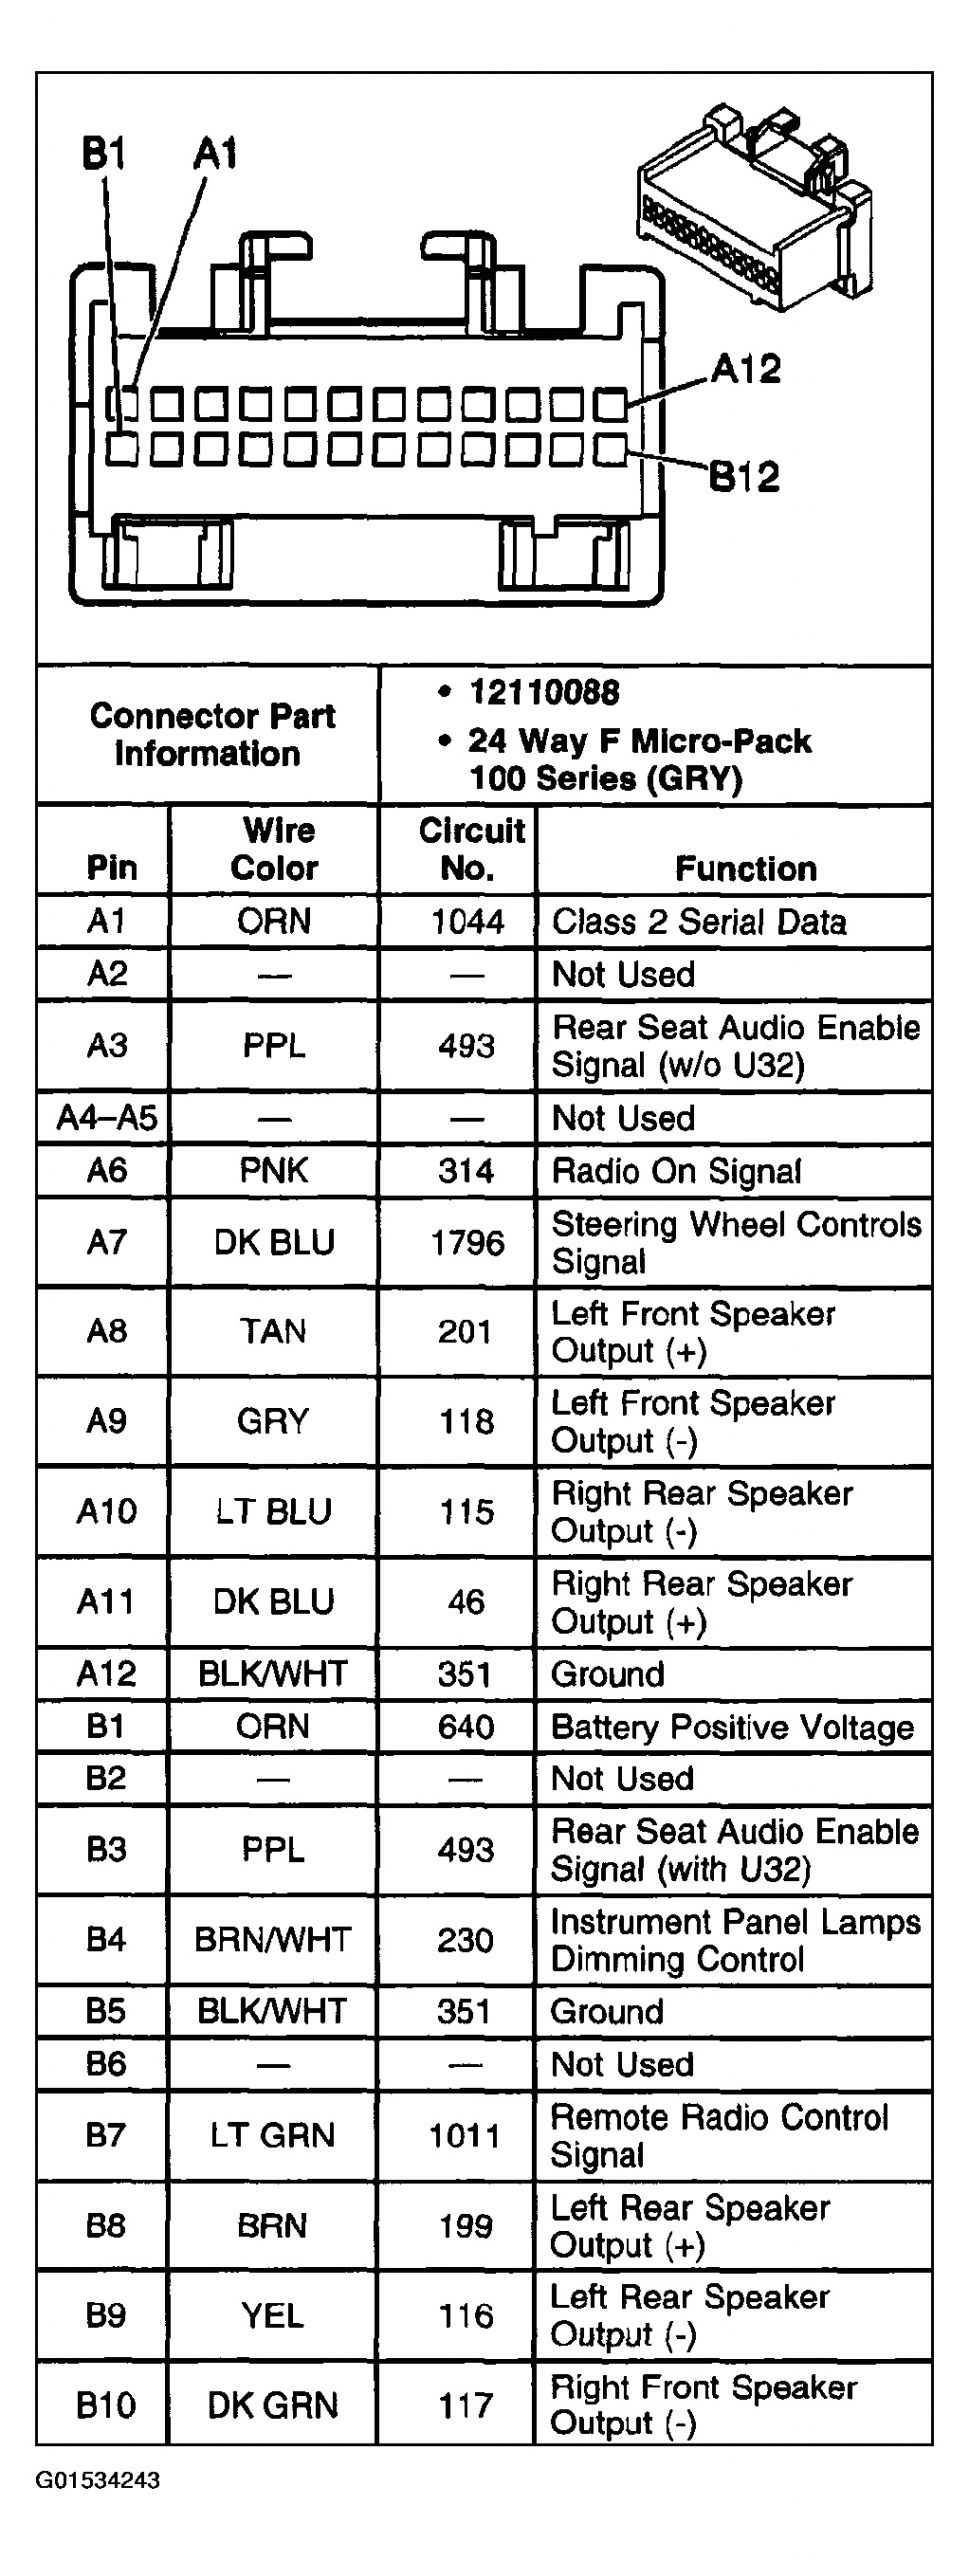 1997 Honda Accord Stereo Wiring Diagram Honda Radio Wiring Diagram Rain Manna19 Immofux Freiburg De